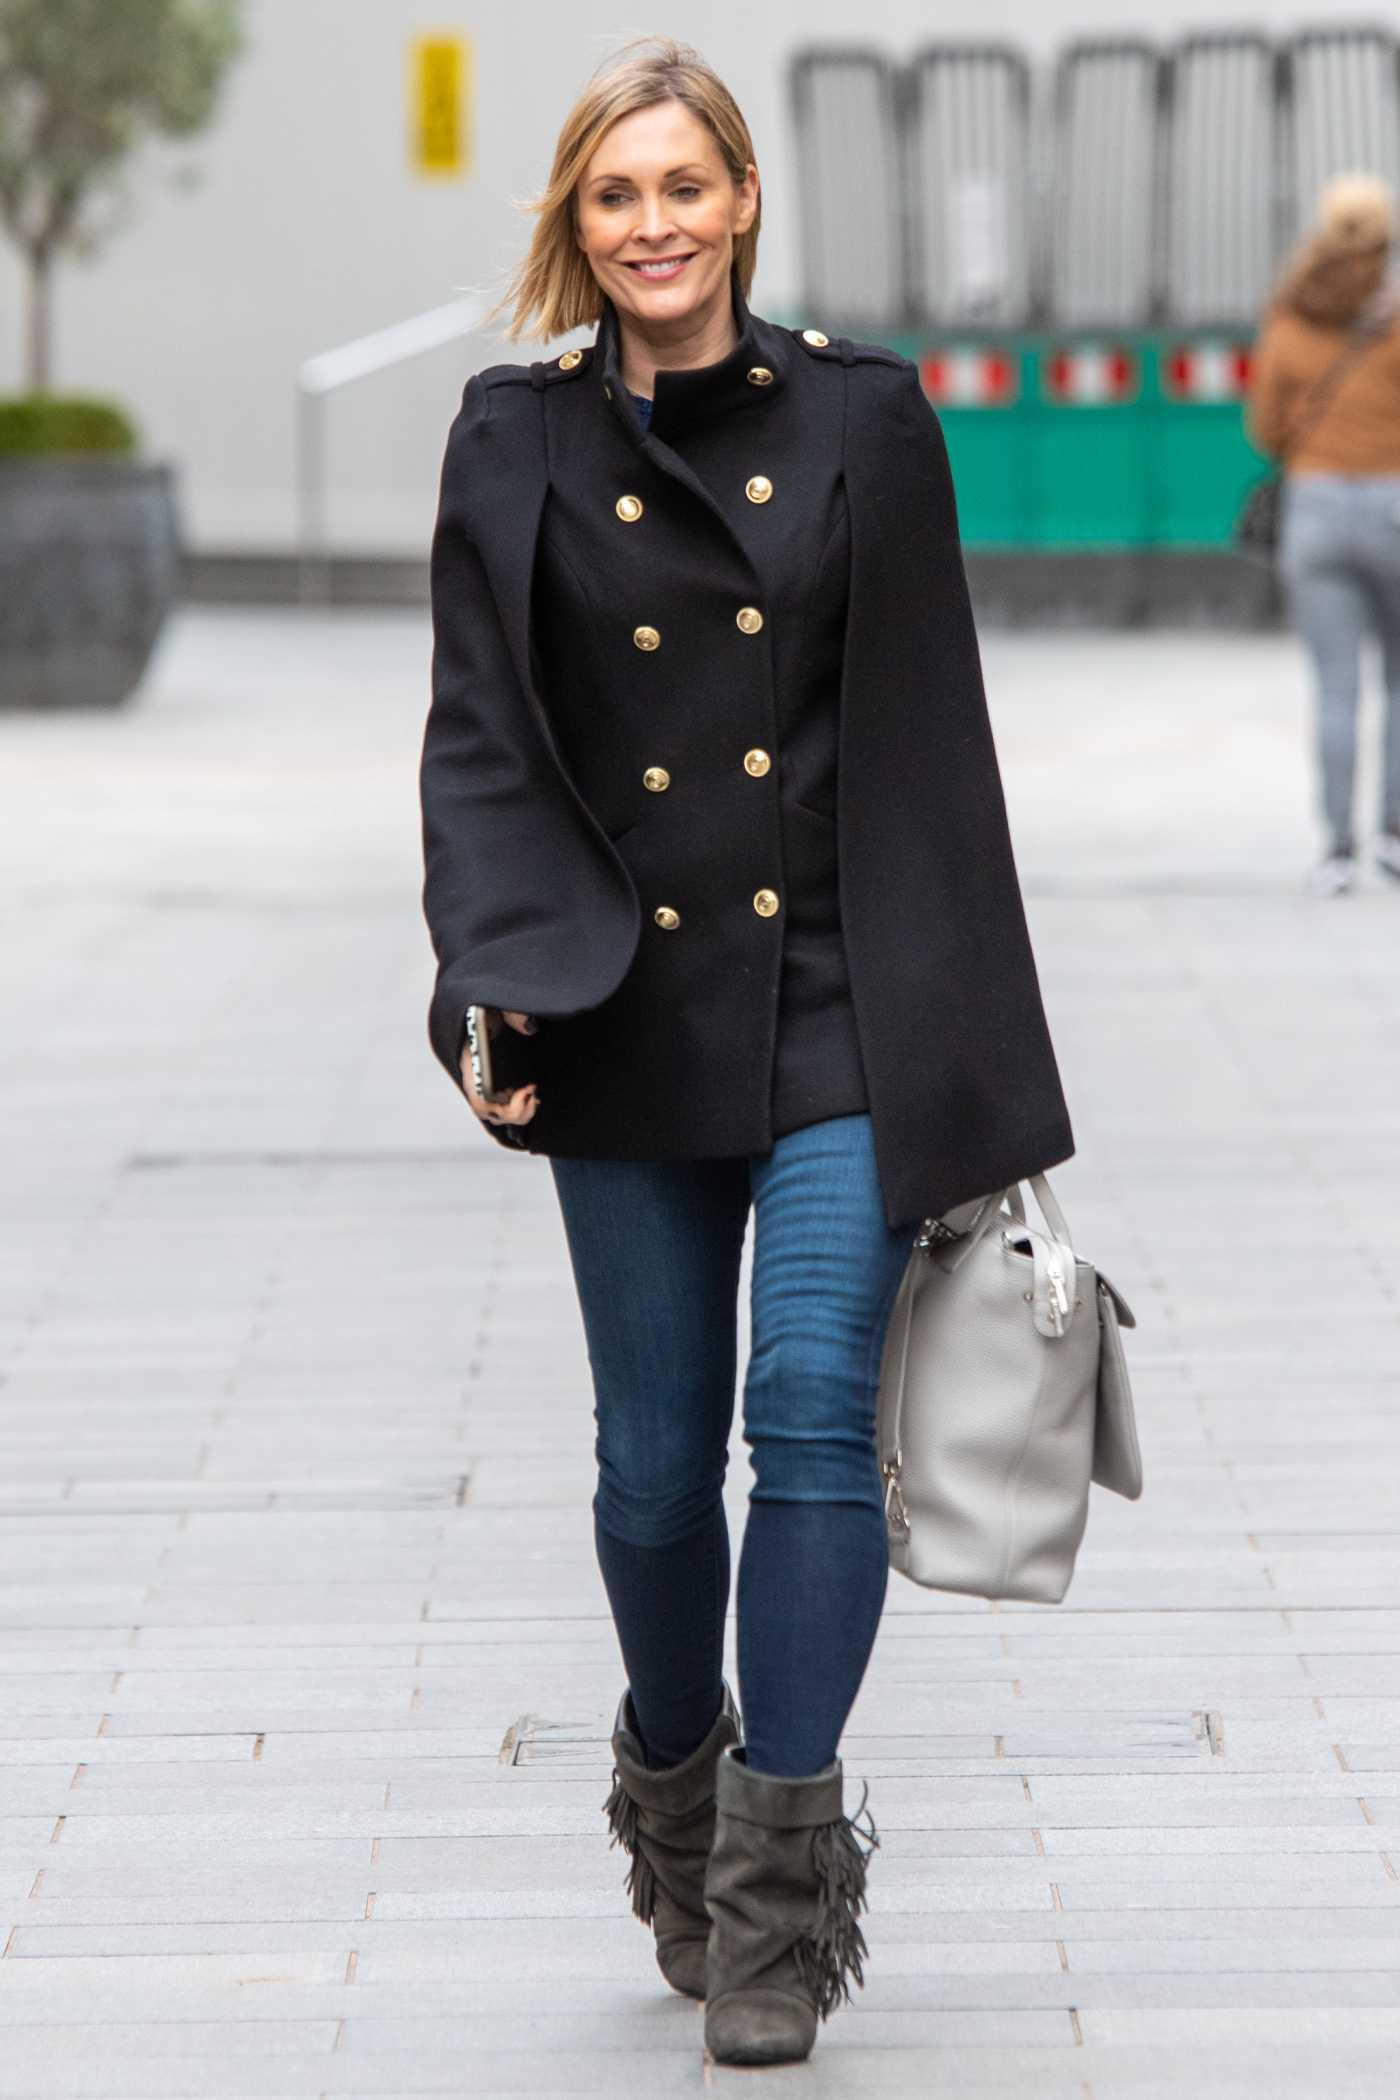 Jenni Falconer in a Black Jacket Leaves the Global Studios in London 02/19/2021